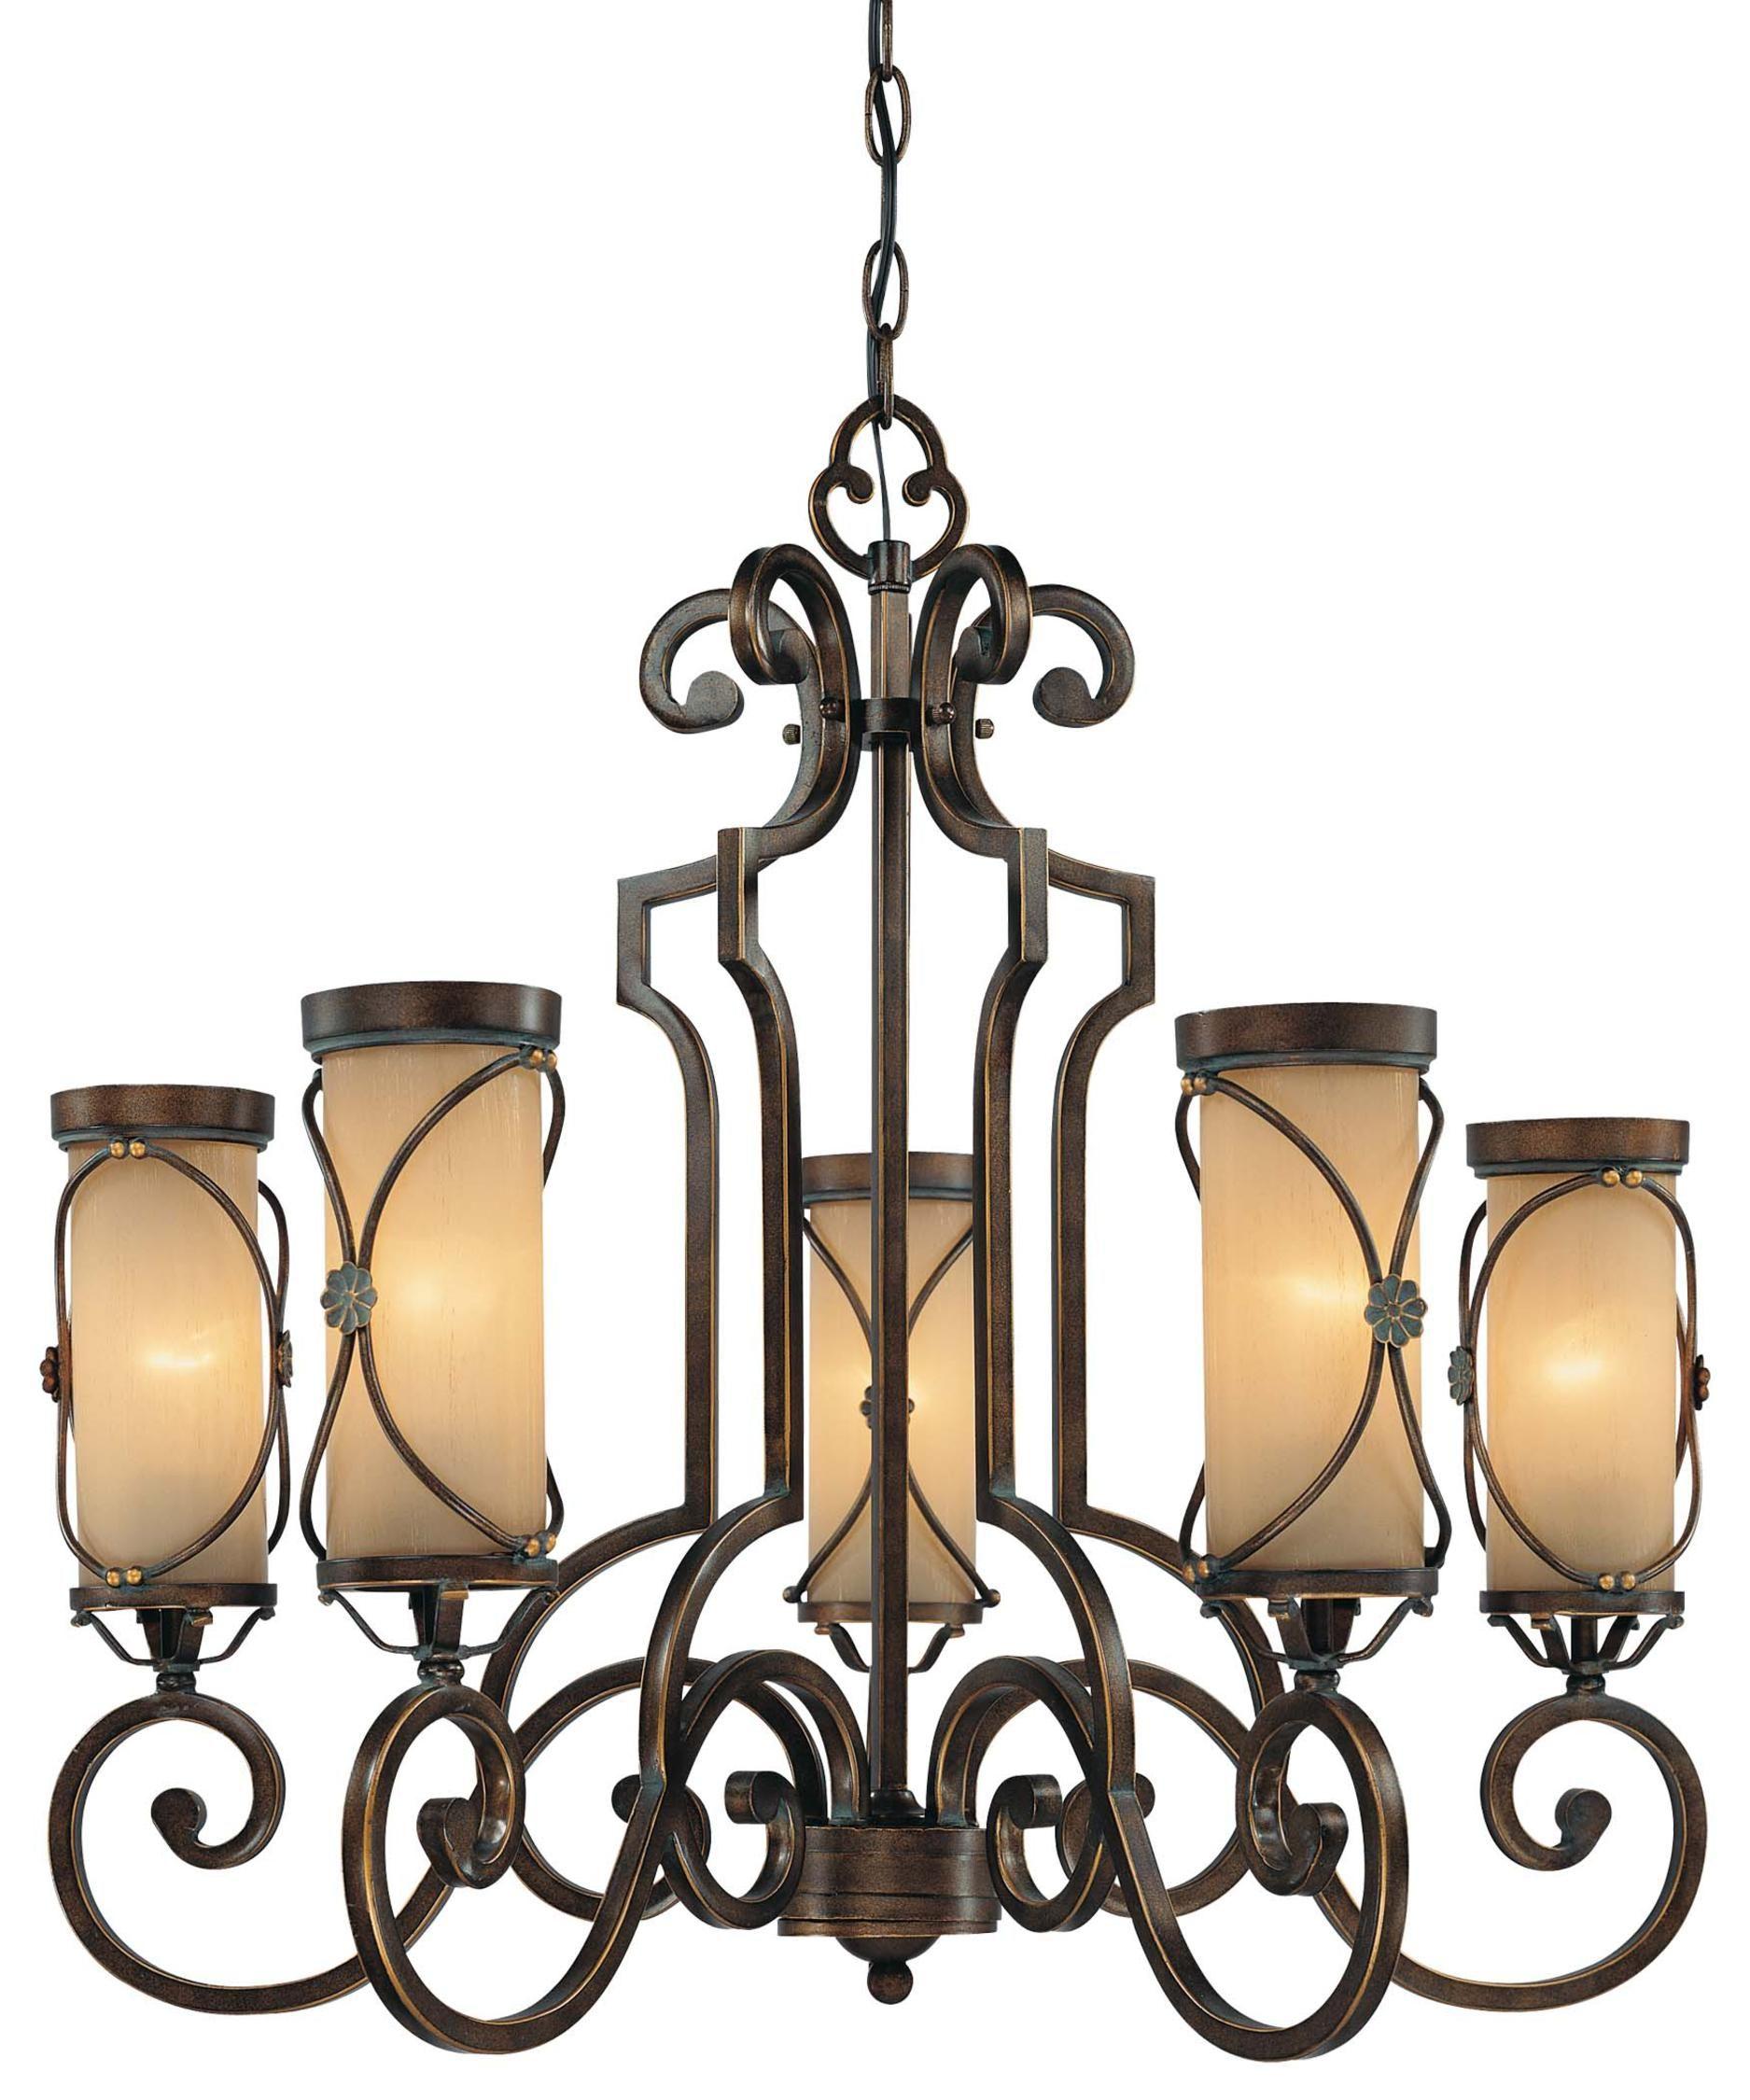 Minka lavery 4235 atterbury 29 inch chandelier capitol lighting minka lavery 4235 atterbury 29 inch chandelier capitol lighting 1 800lighting mozeypictures Image collections